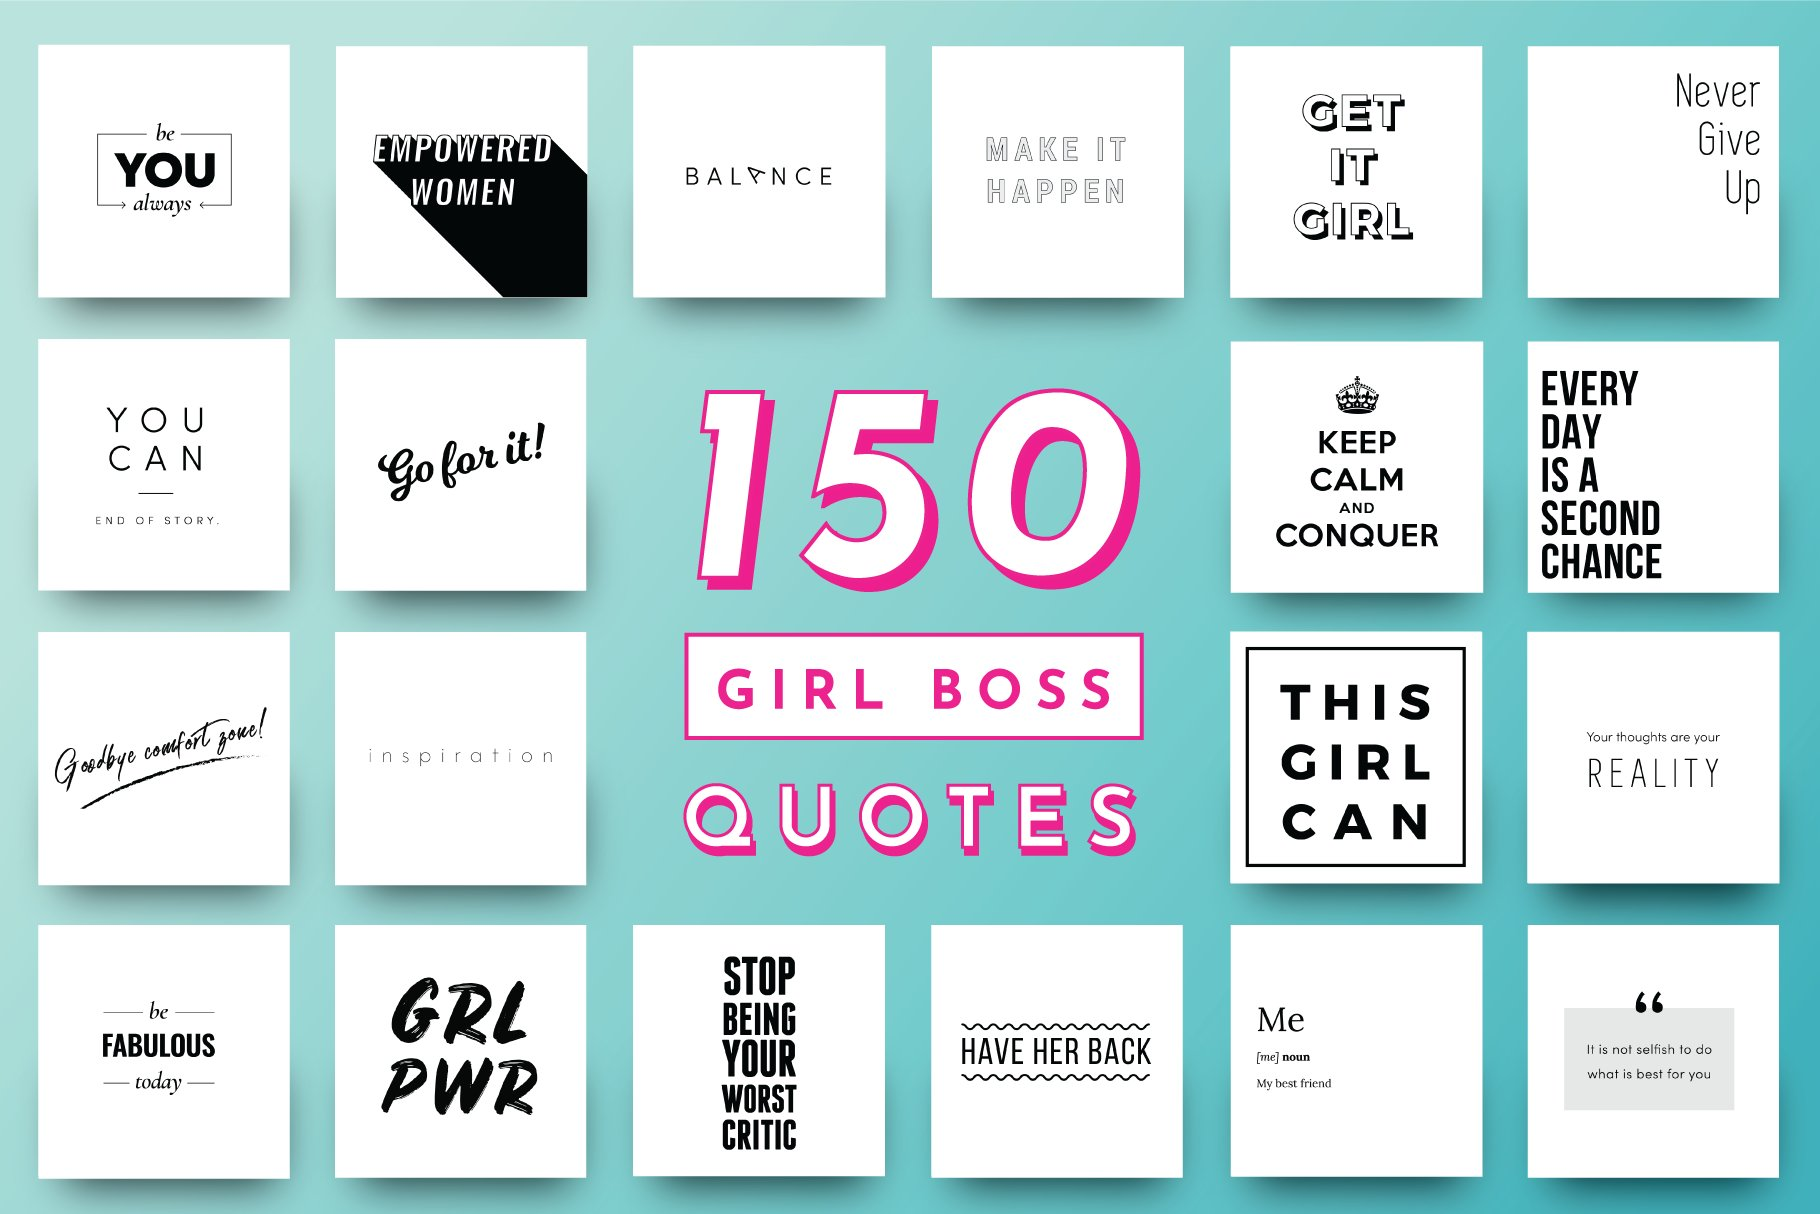 girl-boss-quotes-marketing6-.jpg